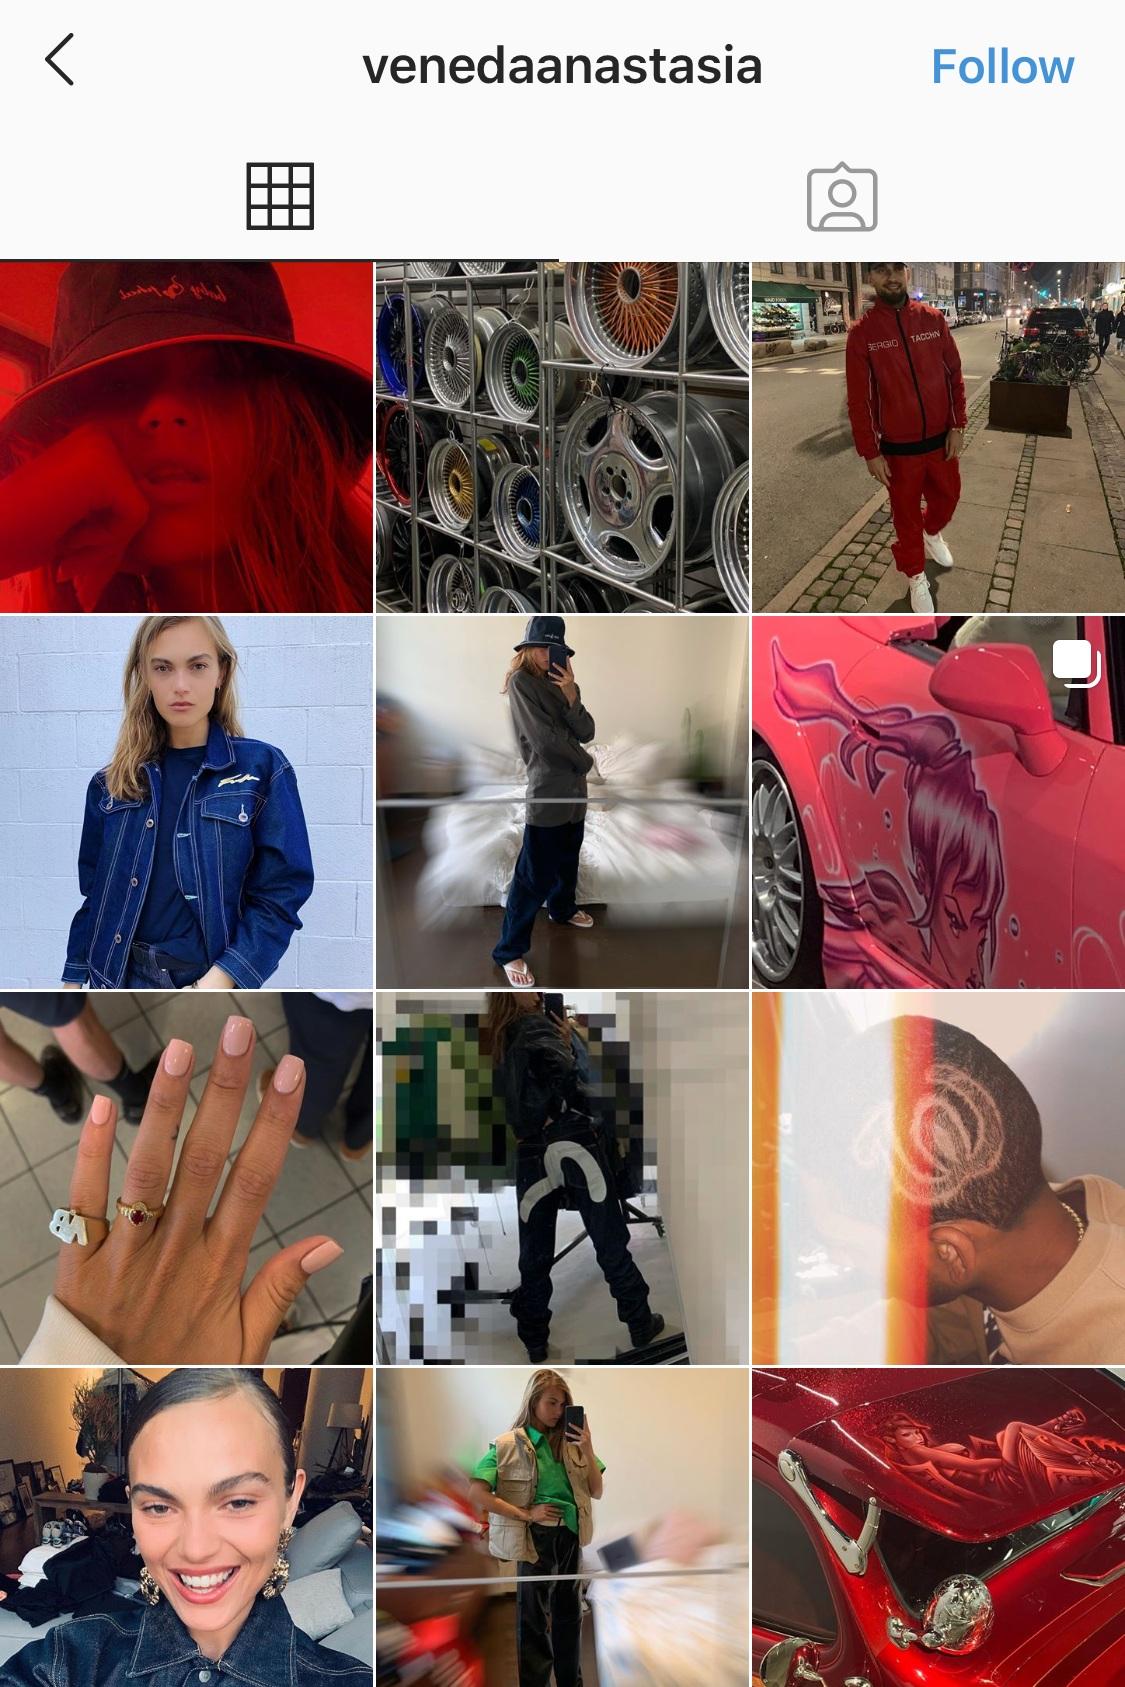 Nordic-Streetwear-Instagram-Venedaanastasia.1.PNG